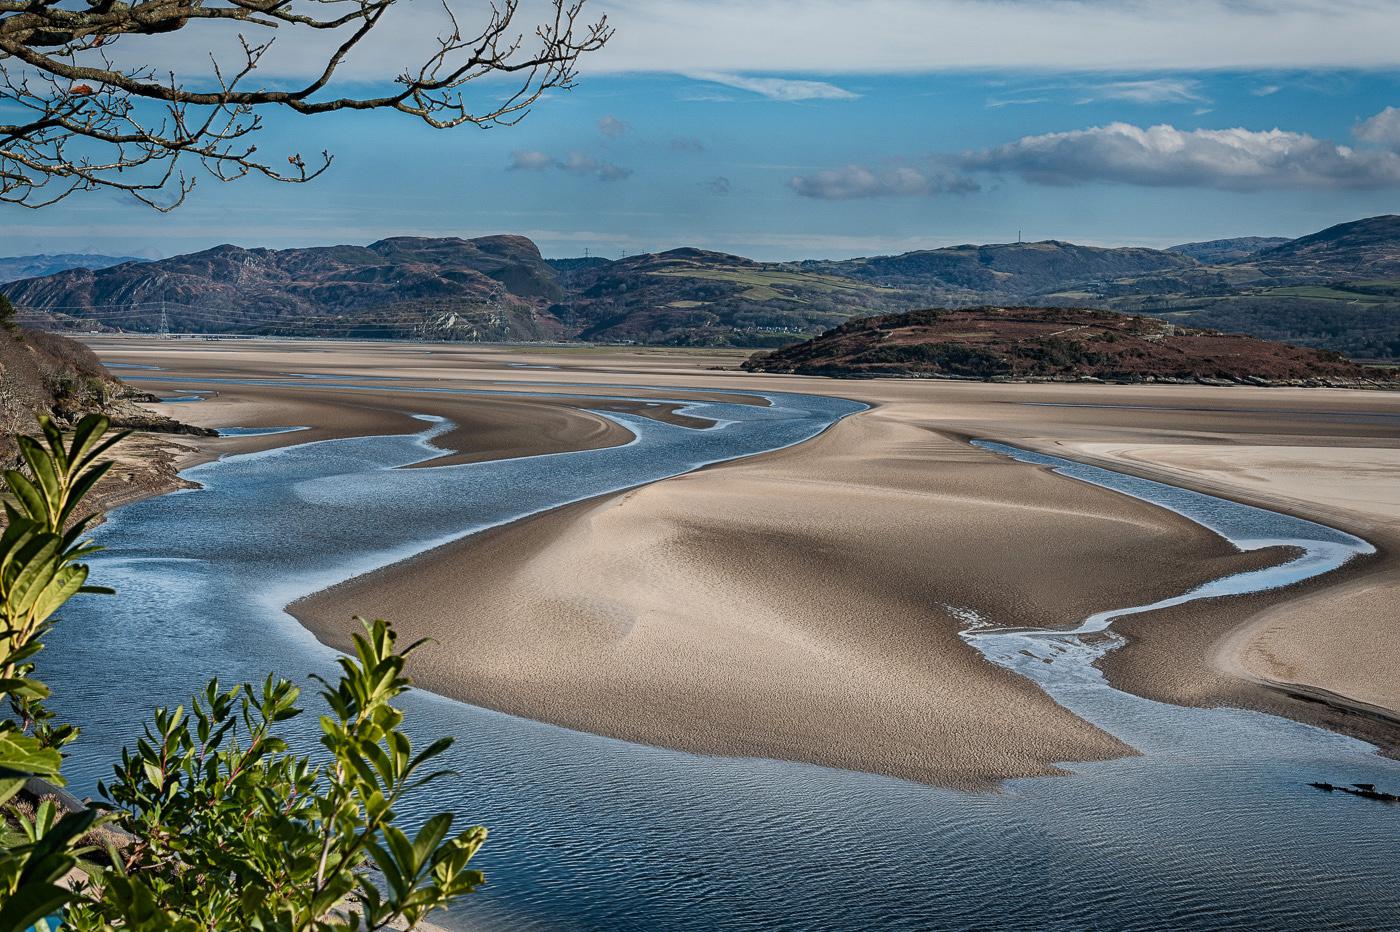 estuary of the River Dwyryd, Portmeirion, Wales, landscape